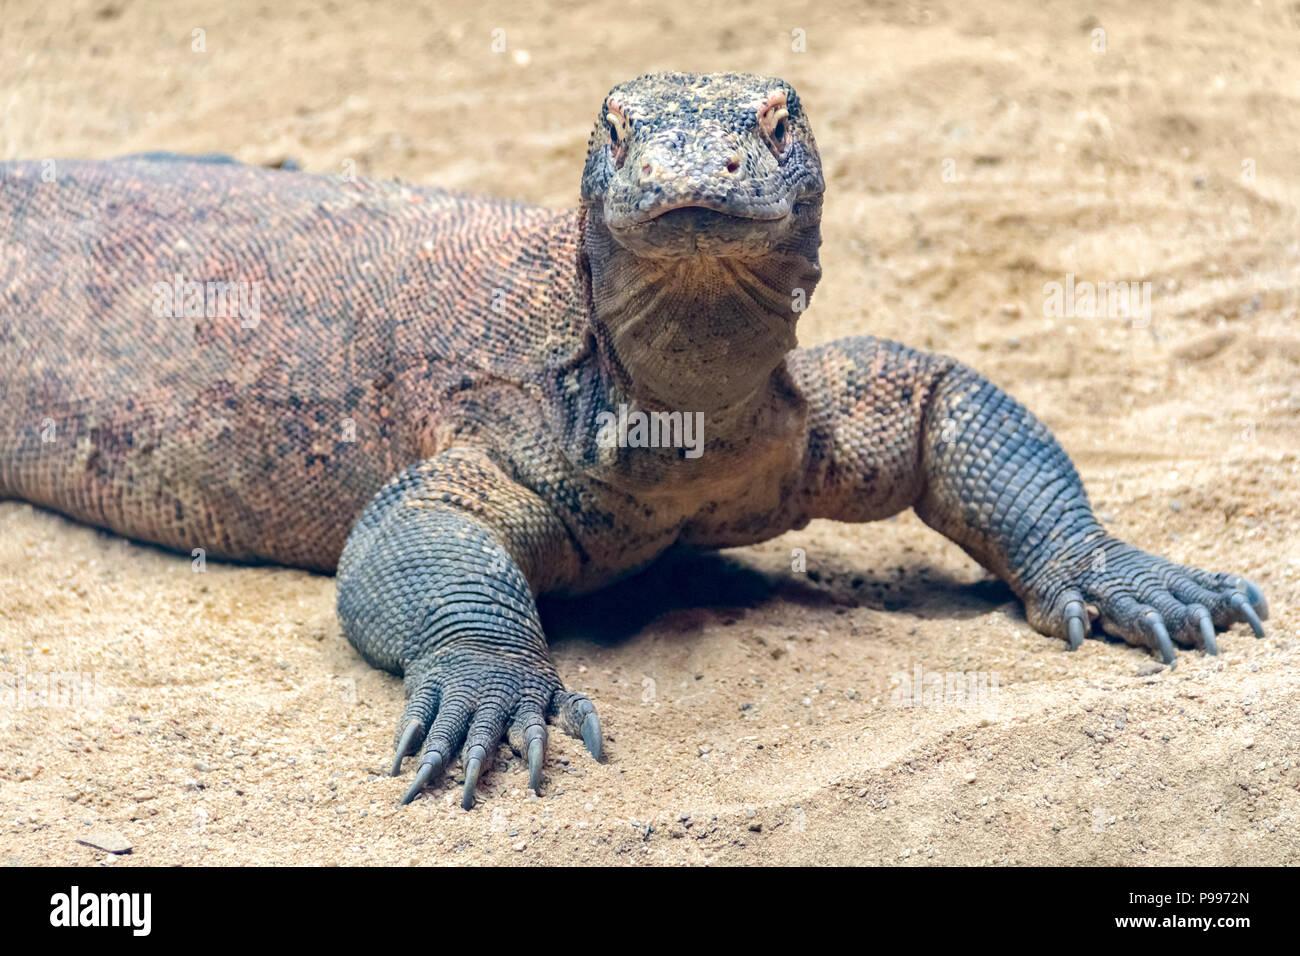 Komodo dragon in sandy light brown ambiance - Stock Image